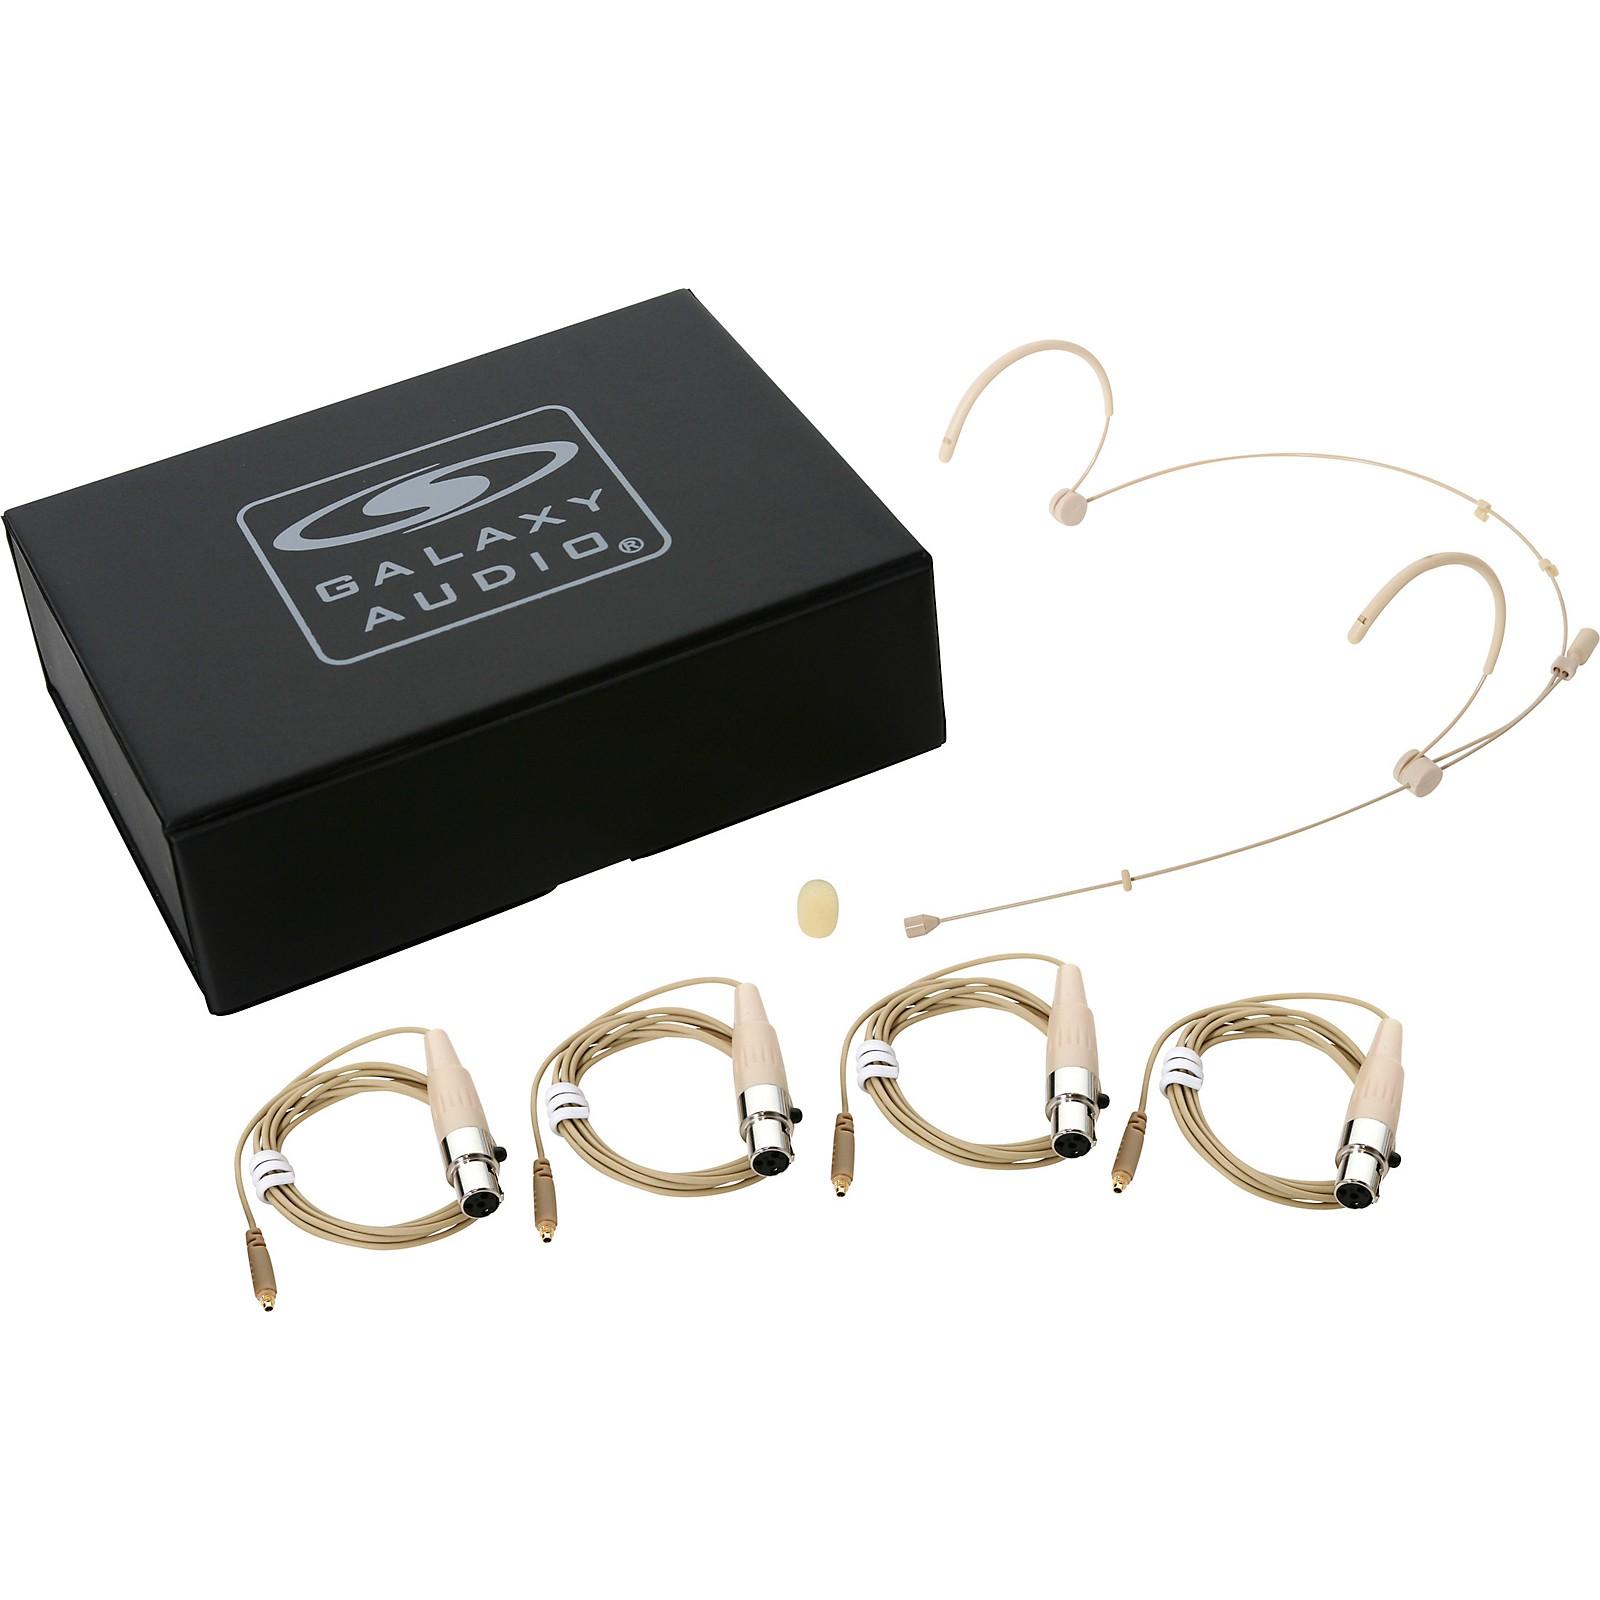 Galaxy Audio HSM3 Dual Ear Headset Microphone for Galaxy Audio/AKG Systems